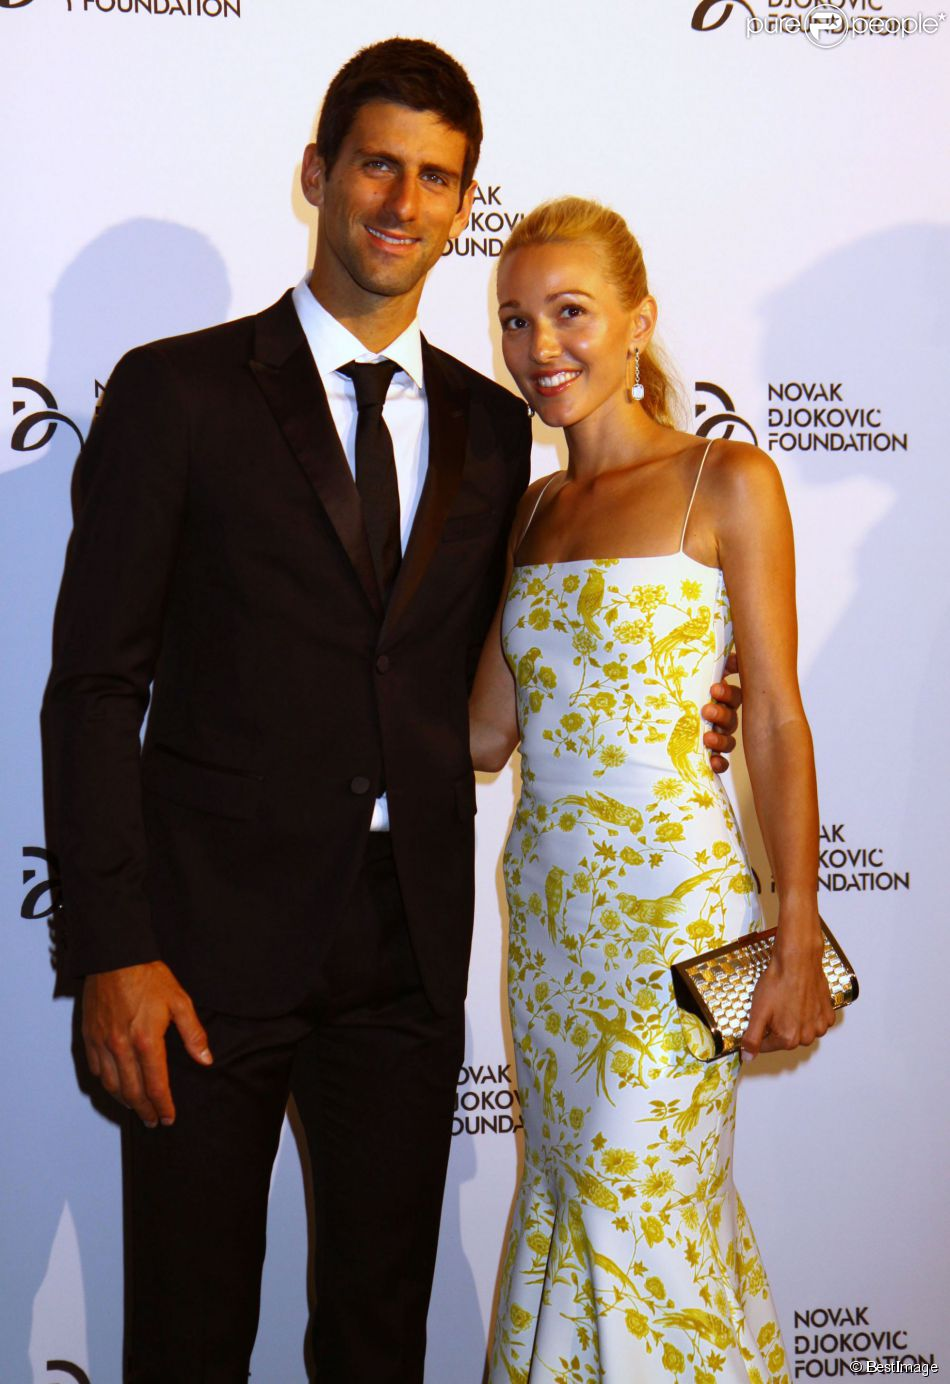 Novak Djokovic et sa compagne Jelena Ristic lors du dîner de gala de la fondation Novak Djokovic à New York, le 10 septembre 2013.